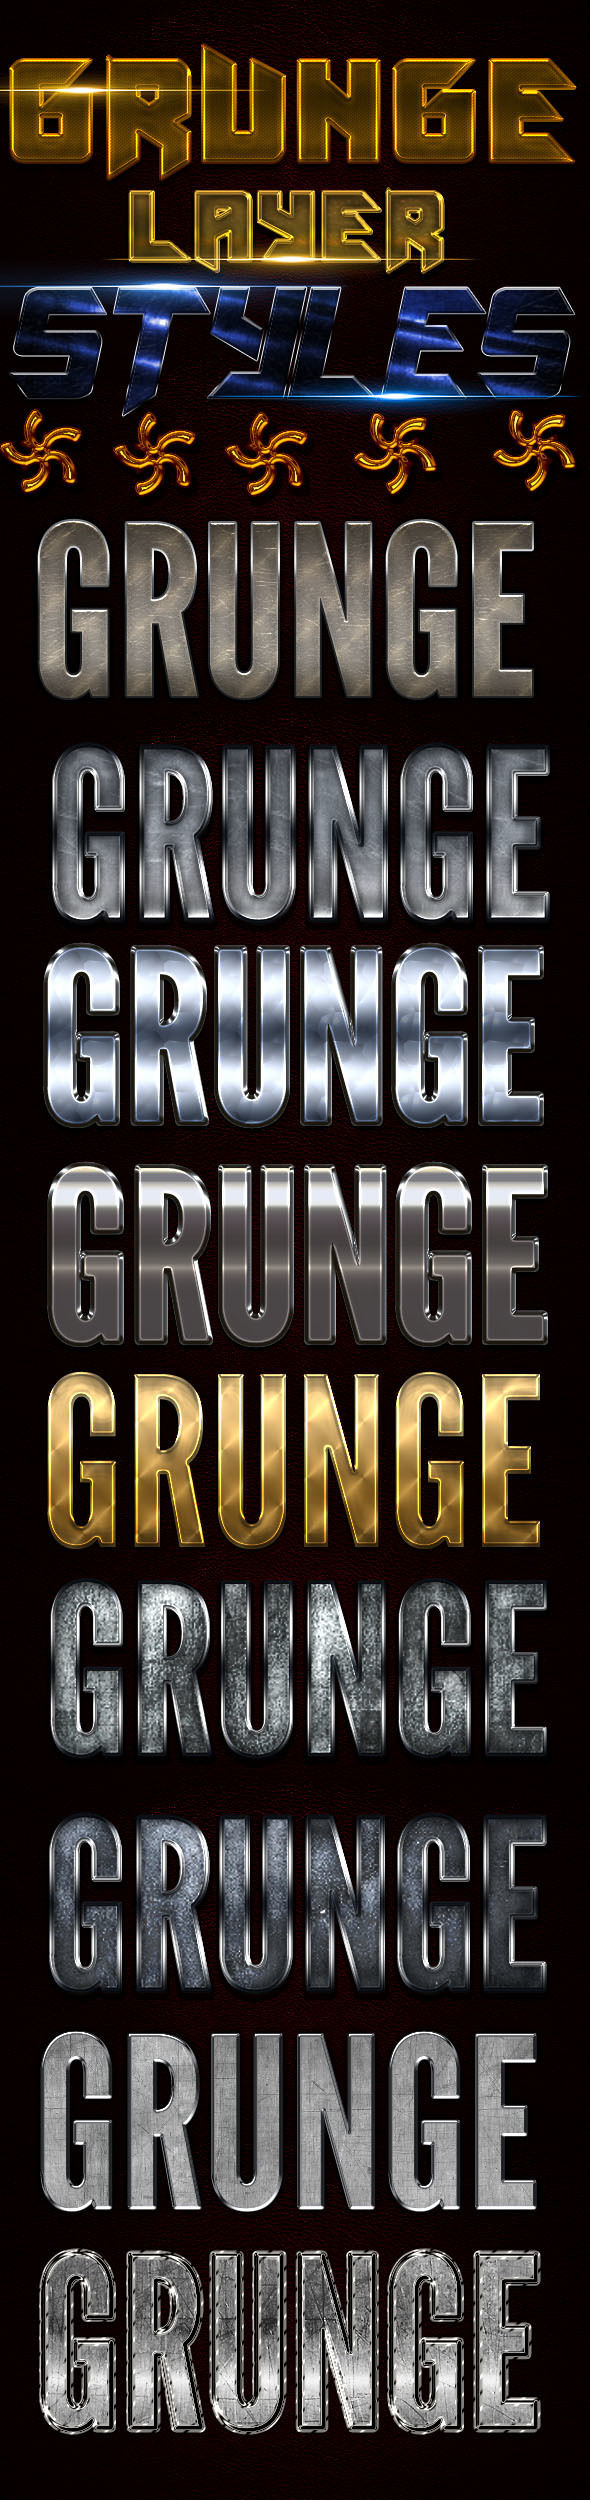 Grunger Layer Styles - Styles Photoshop